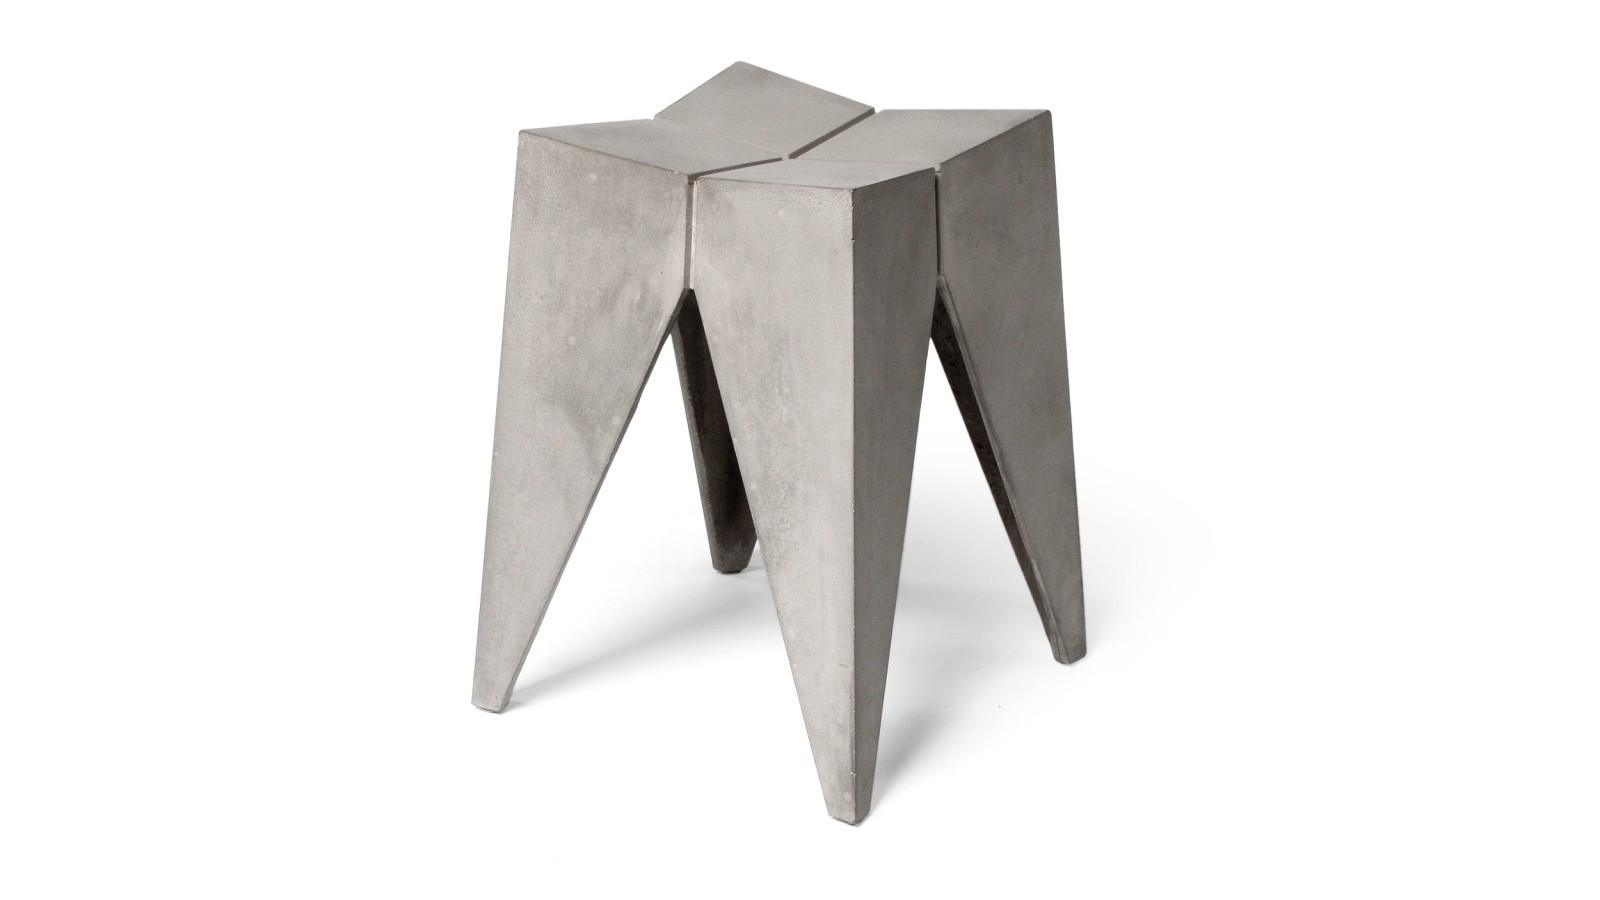 Concrete Stool Bridge